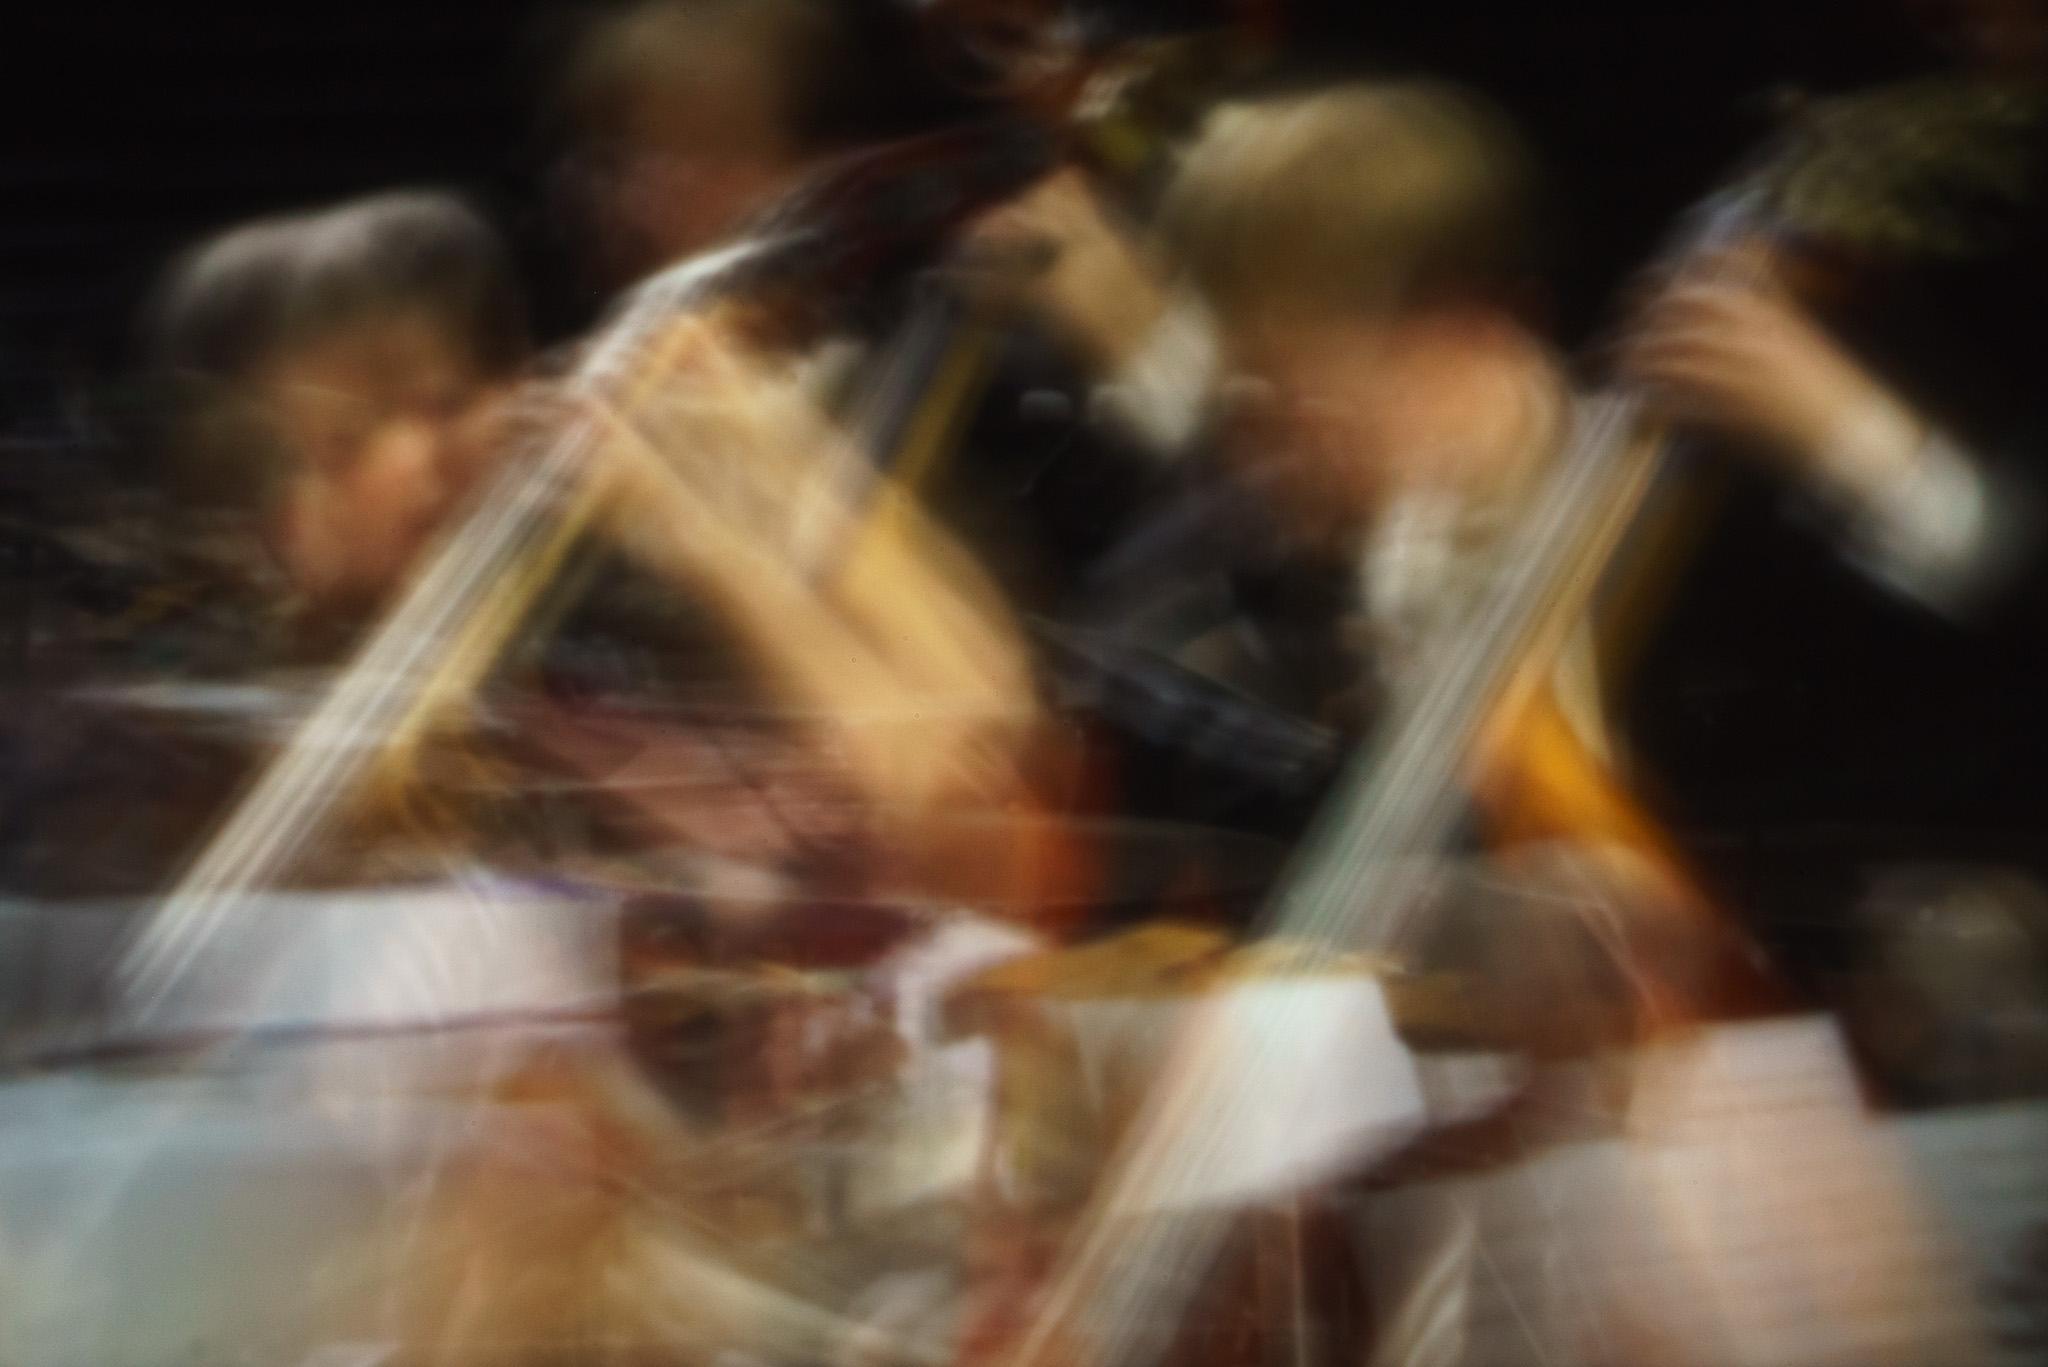 Concerto_Grosso_(03_von_16)